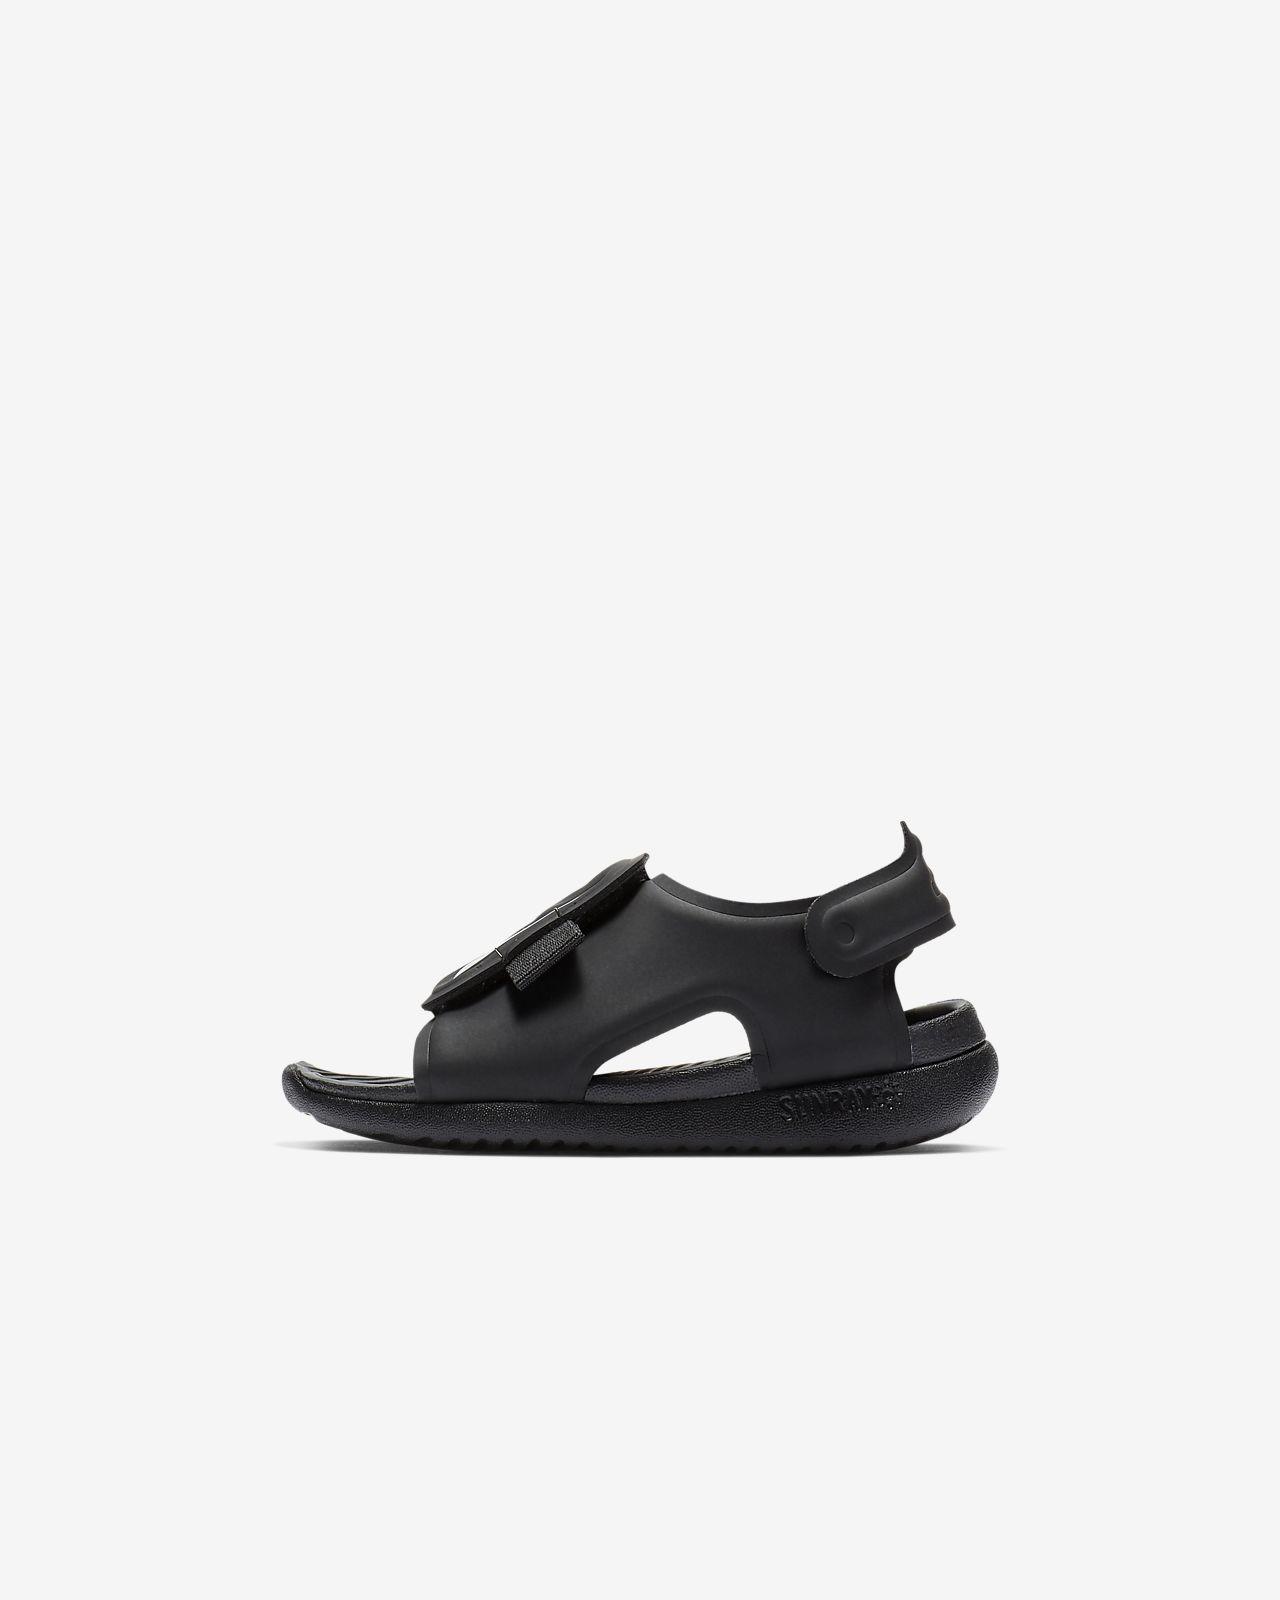 Nike Sunray Adjust 5 Baby & Toddler Sandal